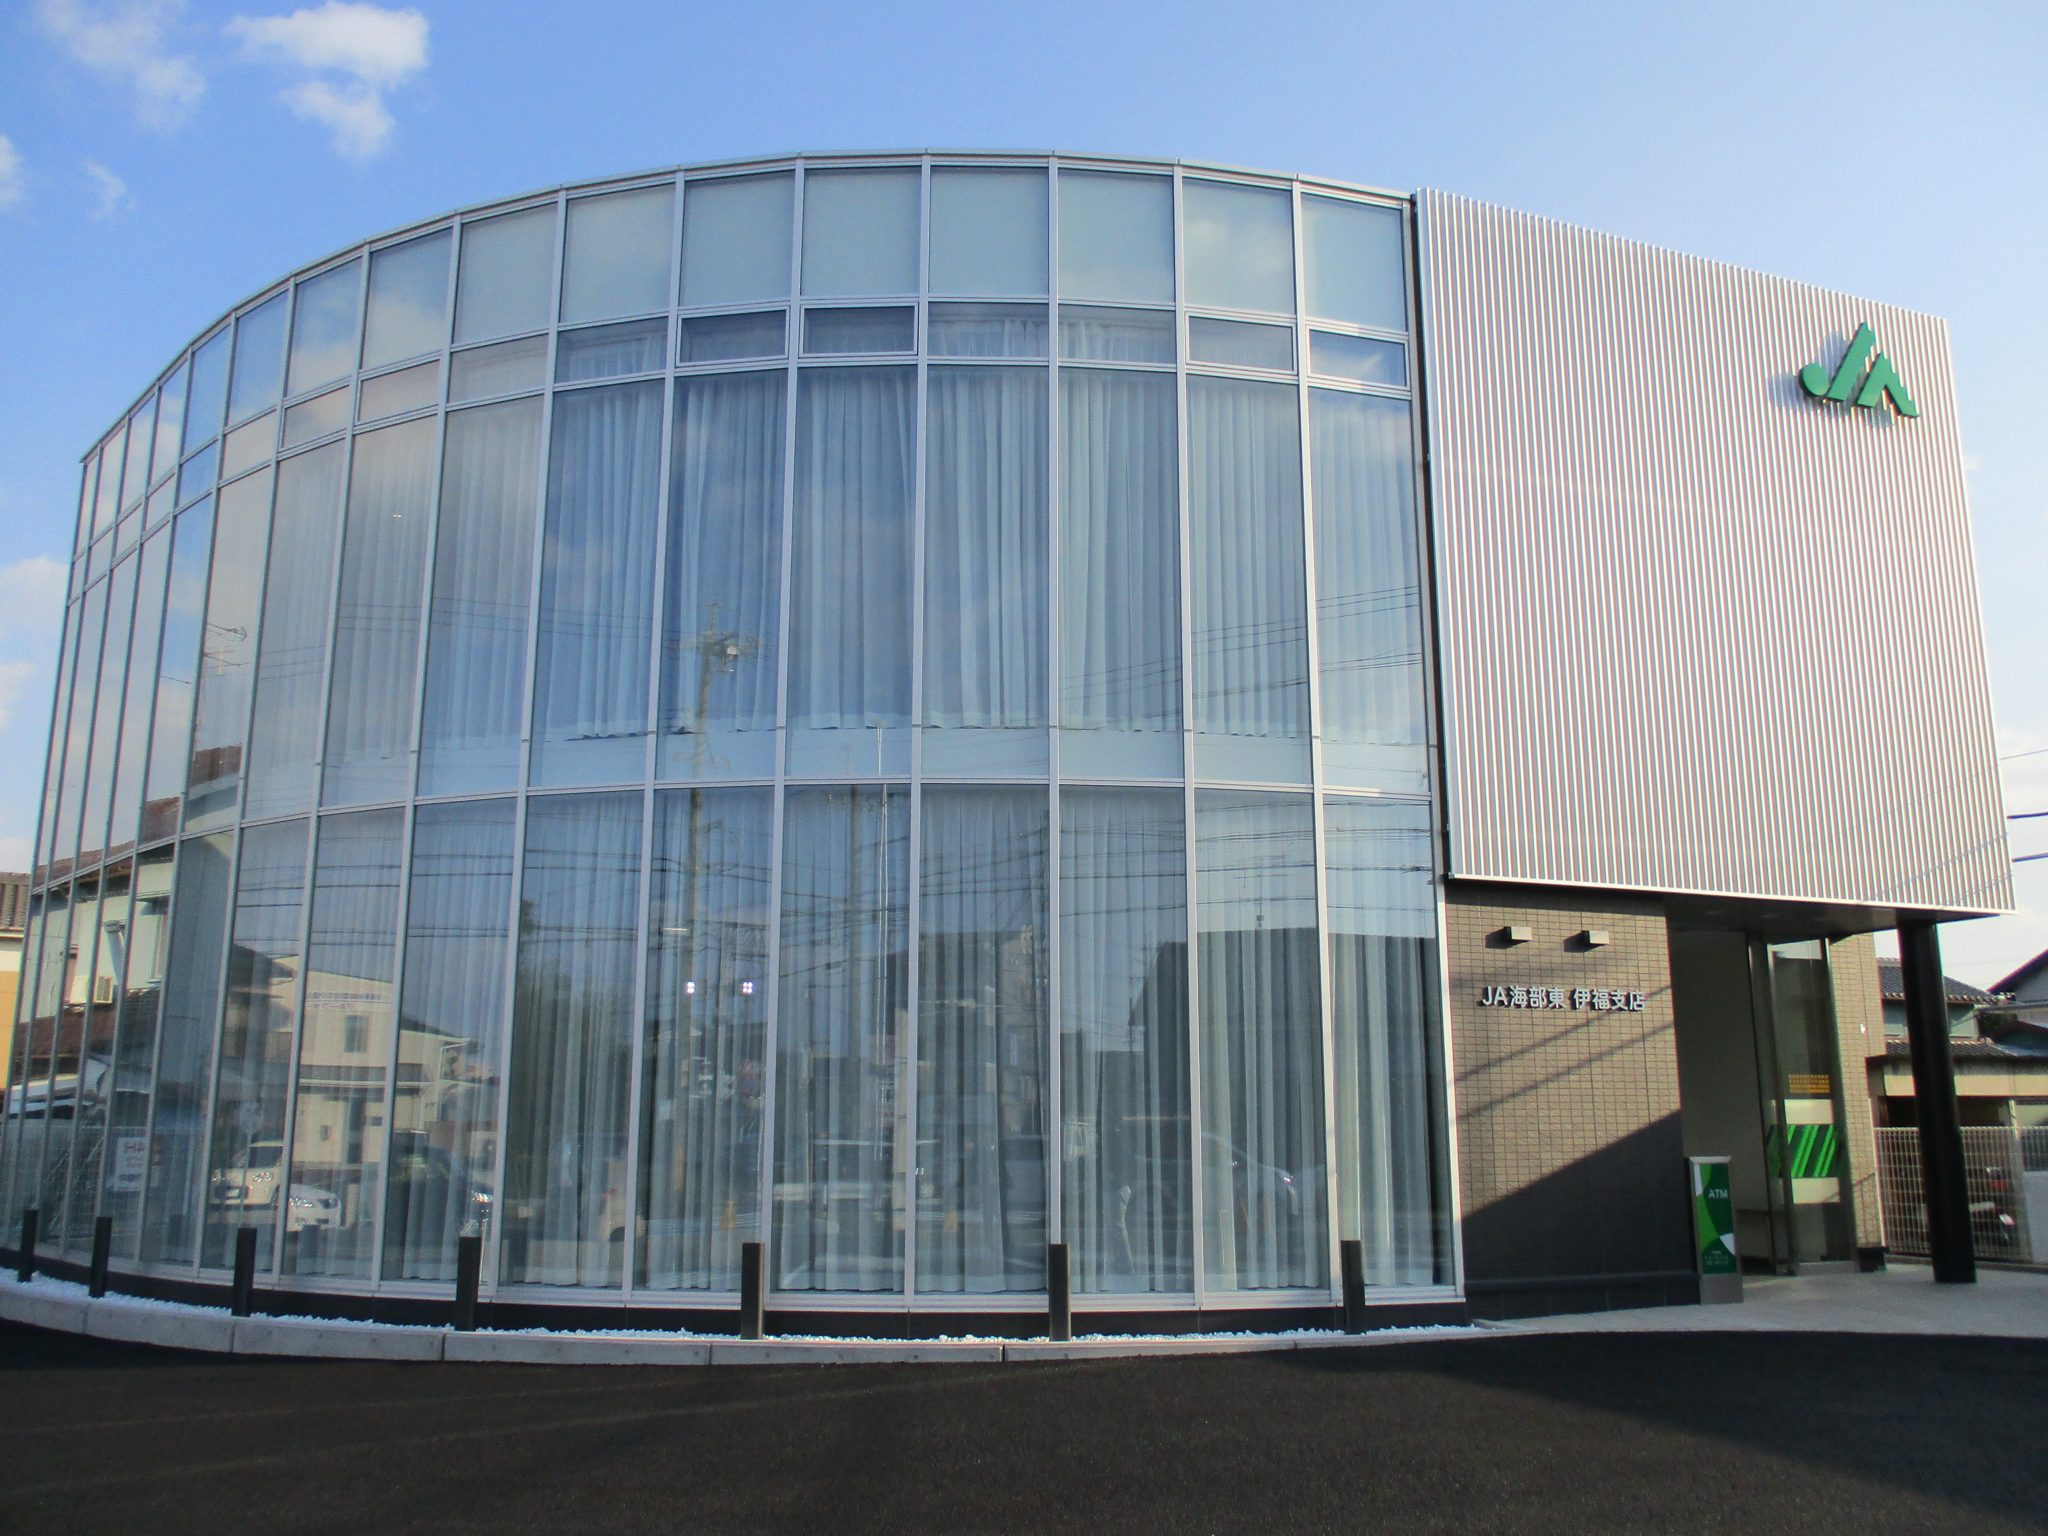 JA 海部東農業協同組合(あまひがし) -伊福支店グランドオープン